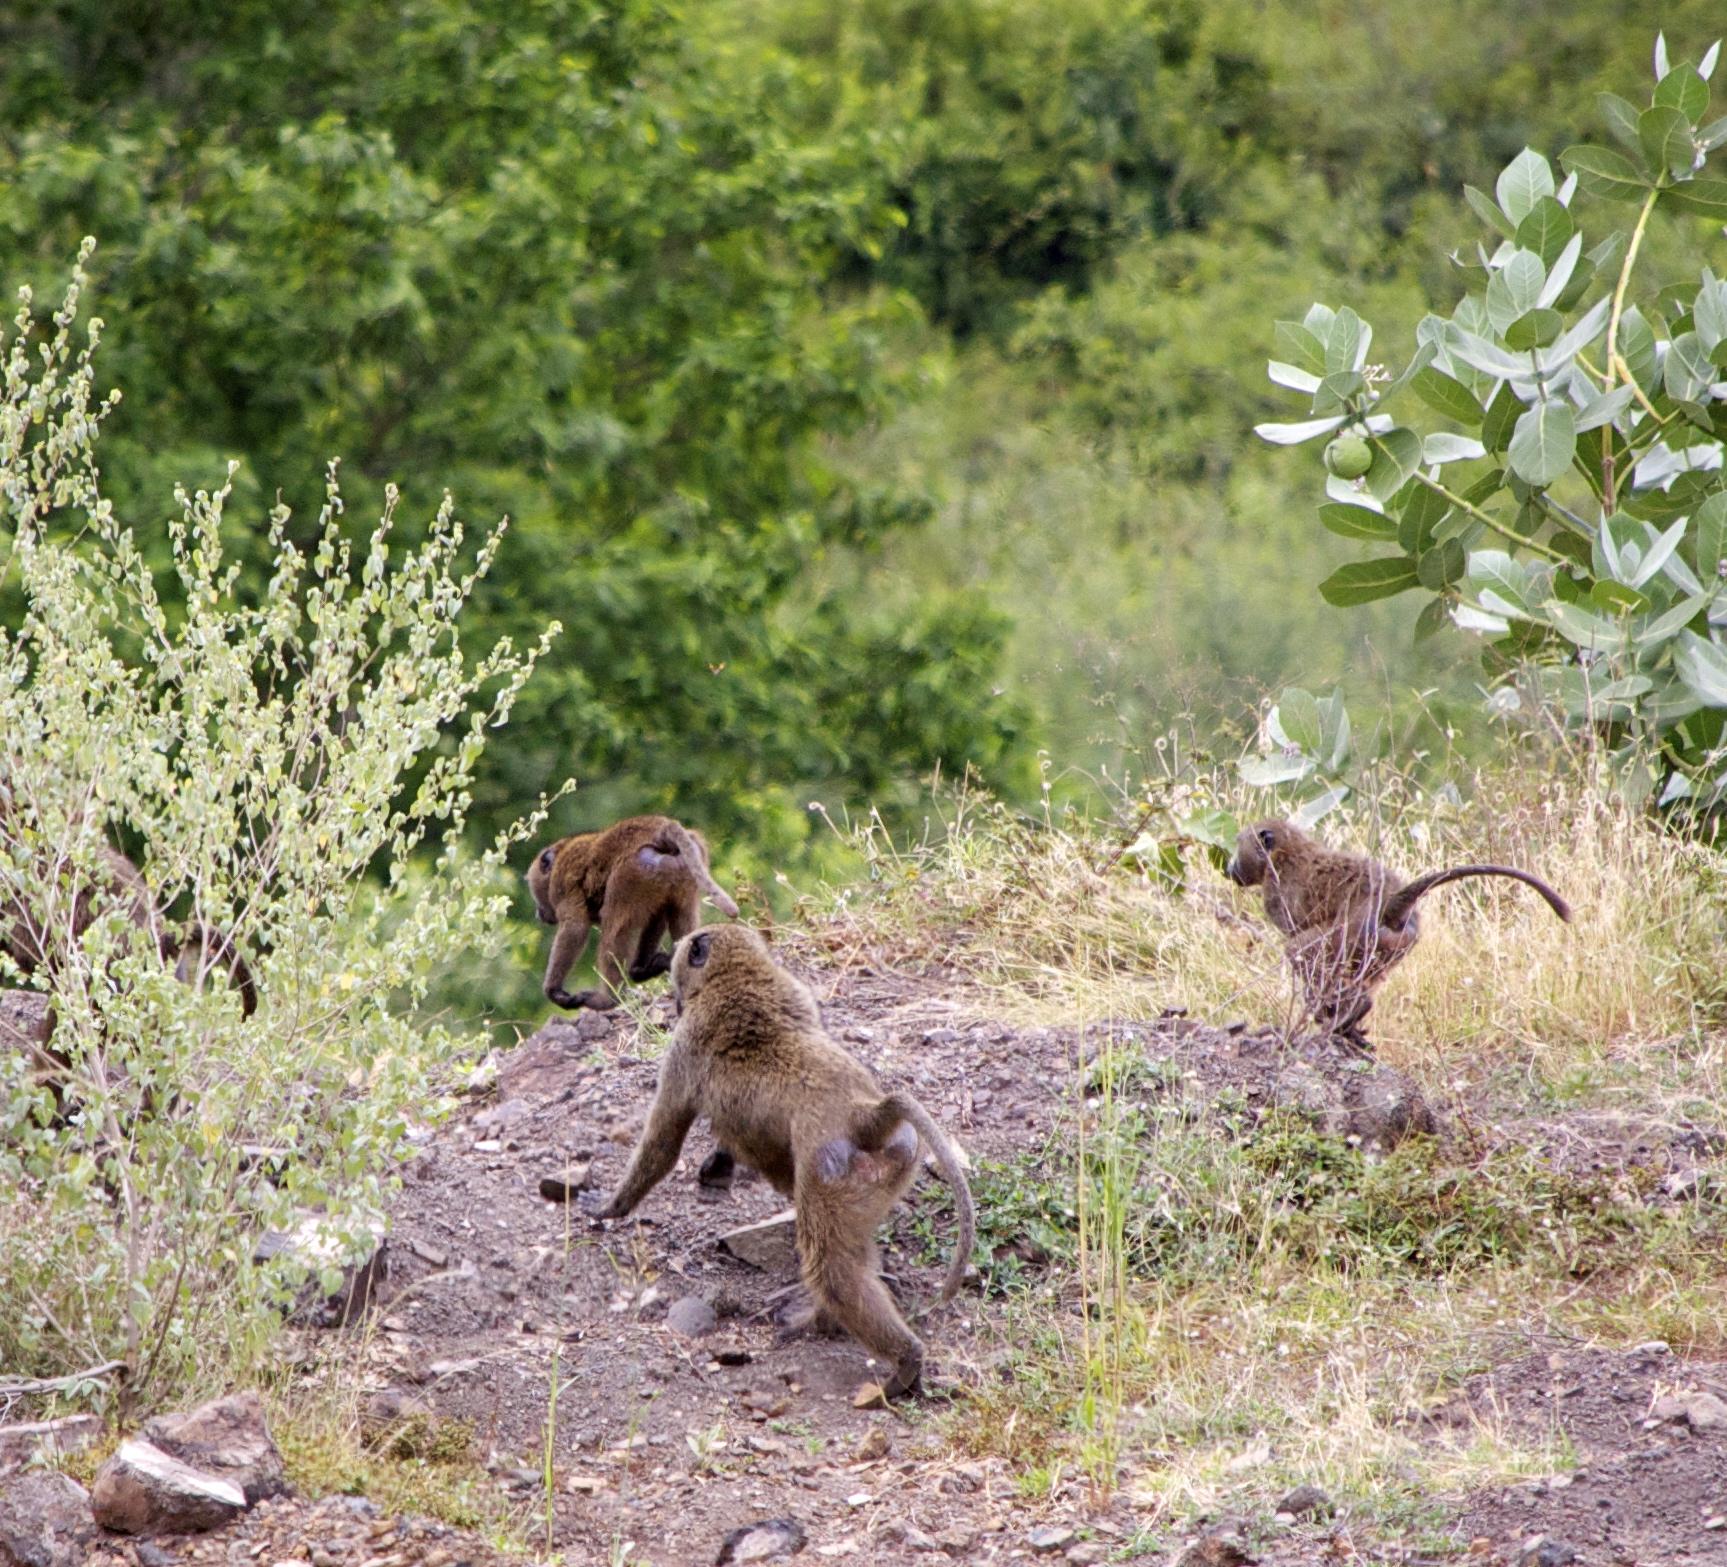 Monkeys in the Omo Valley